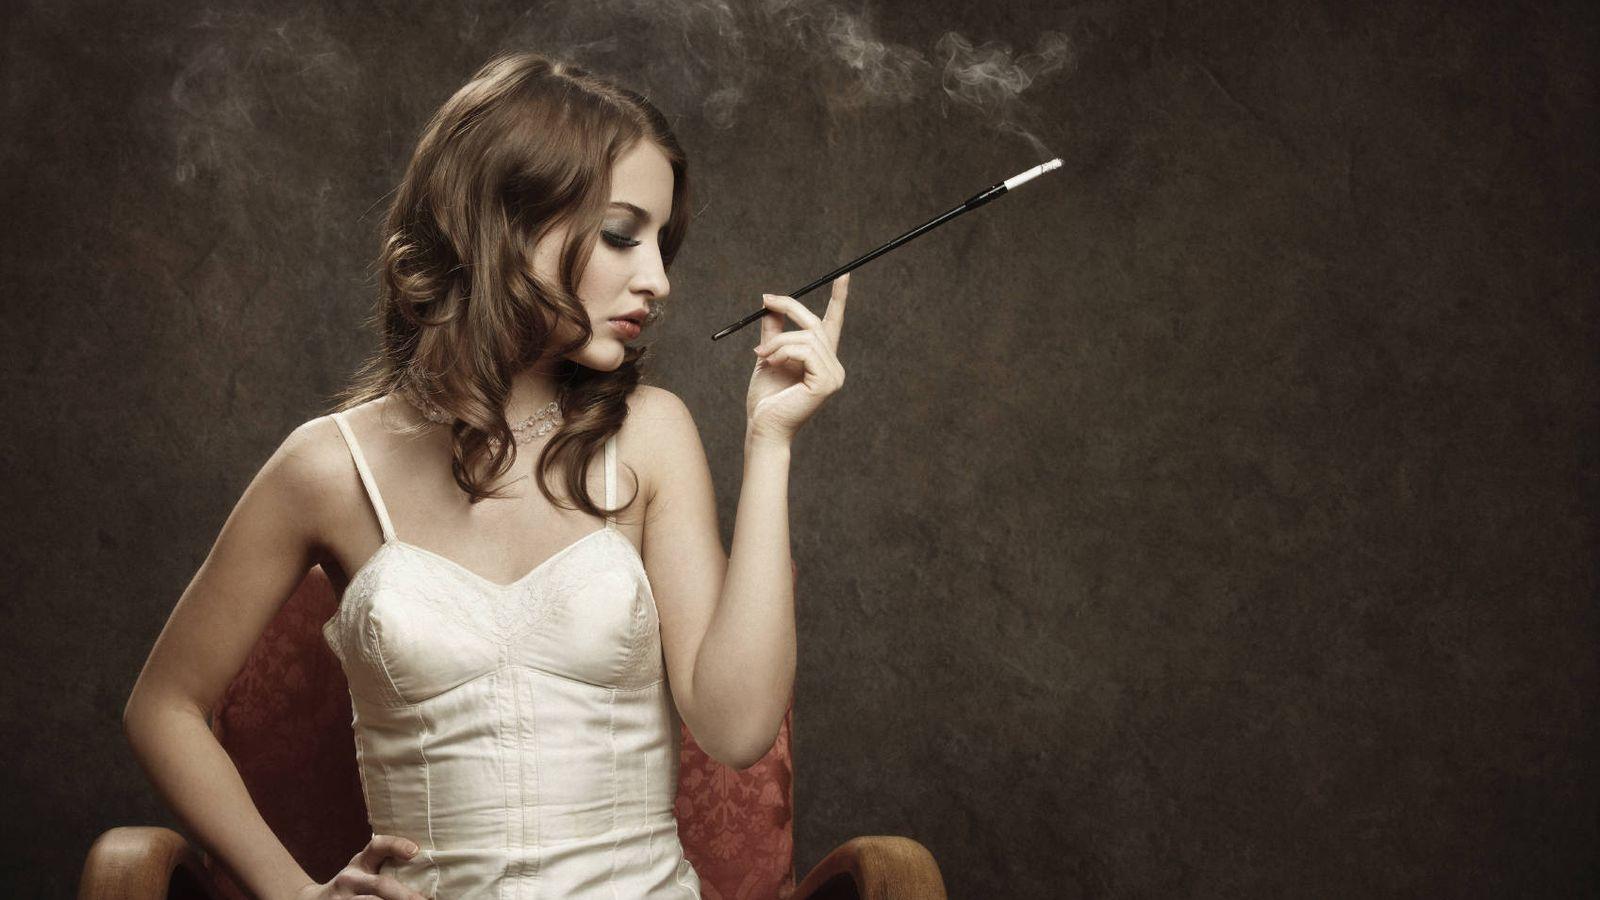 adolescentes con prostitutas pagando a prostitutas